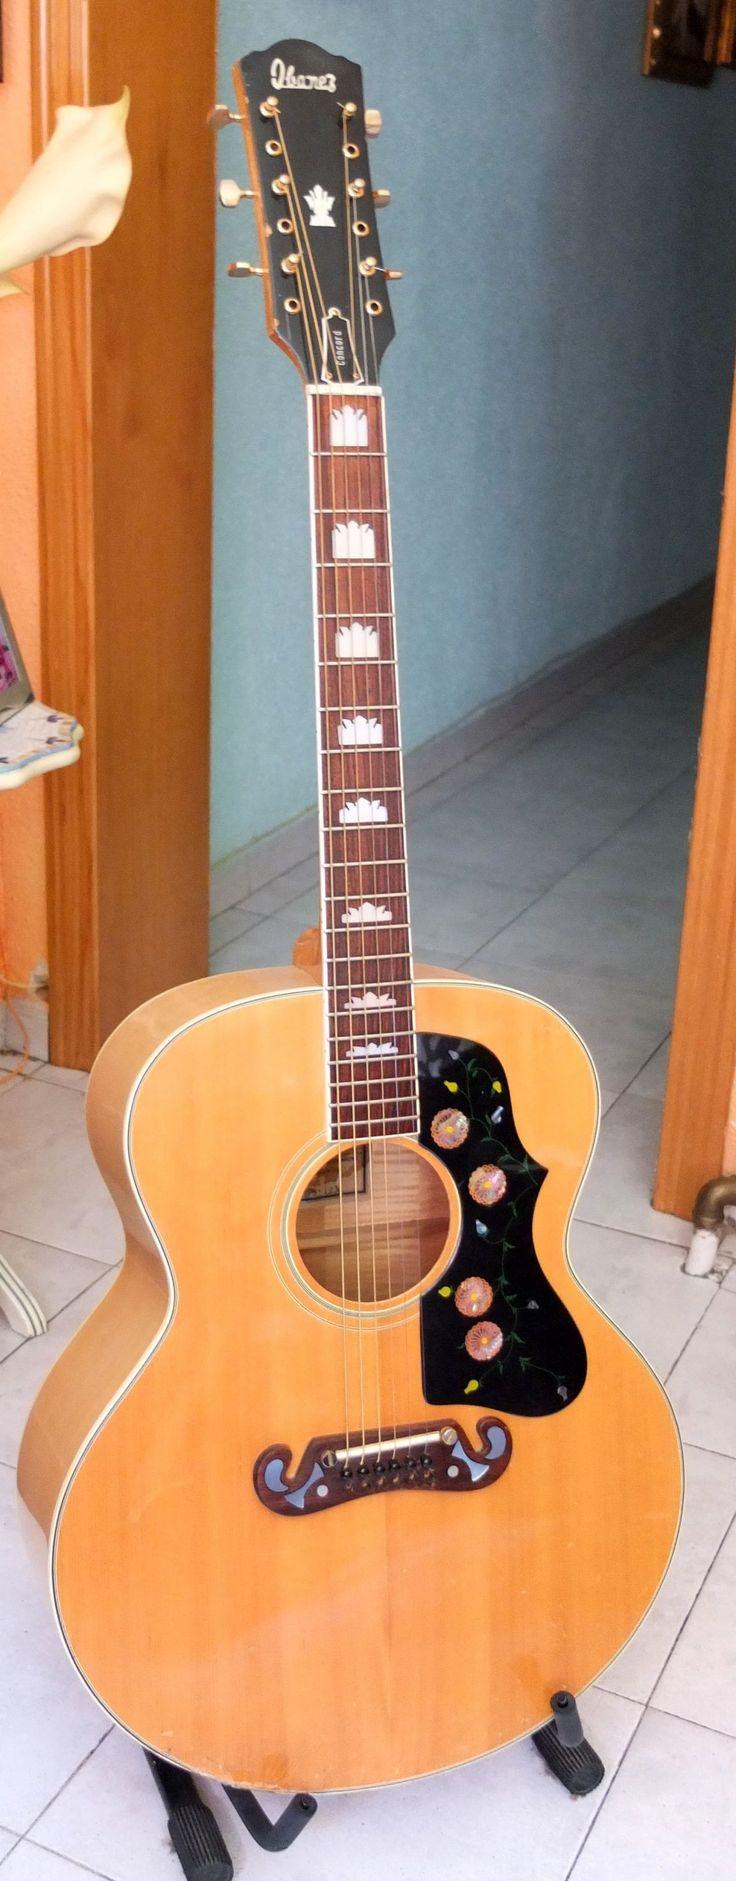 Ibanez Concord 698-12 M Acoustic Jumbo